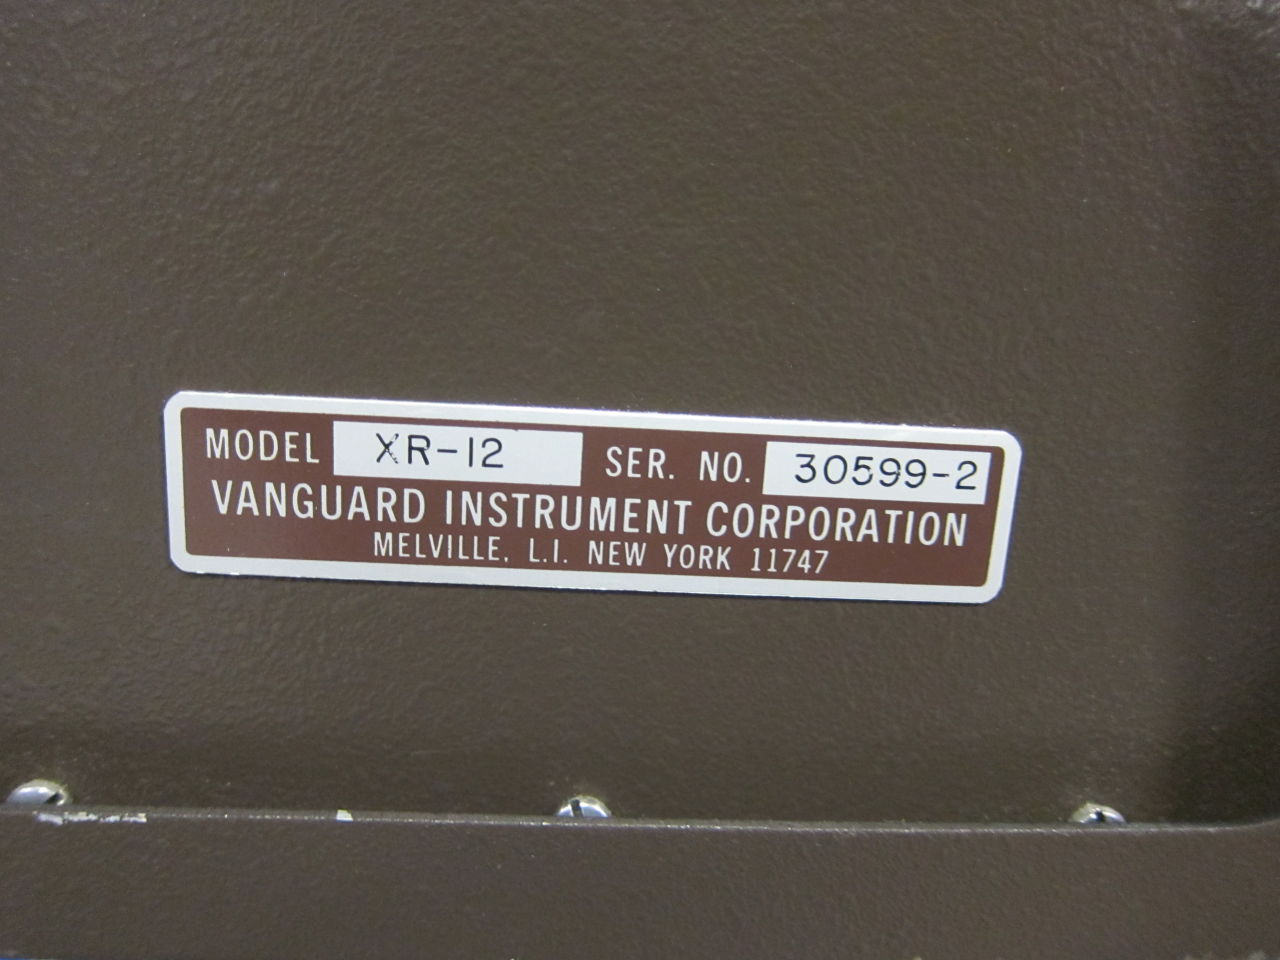 VANGUARD INSTRUMENT CORP. XR-35-4 Film Processor